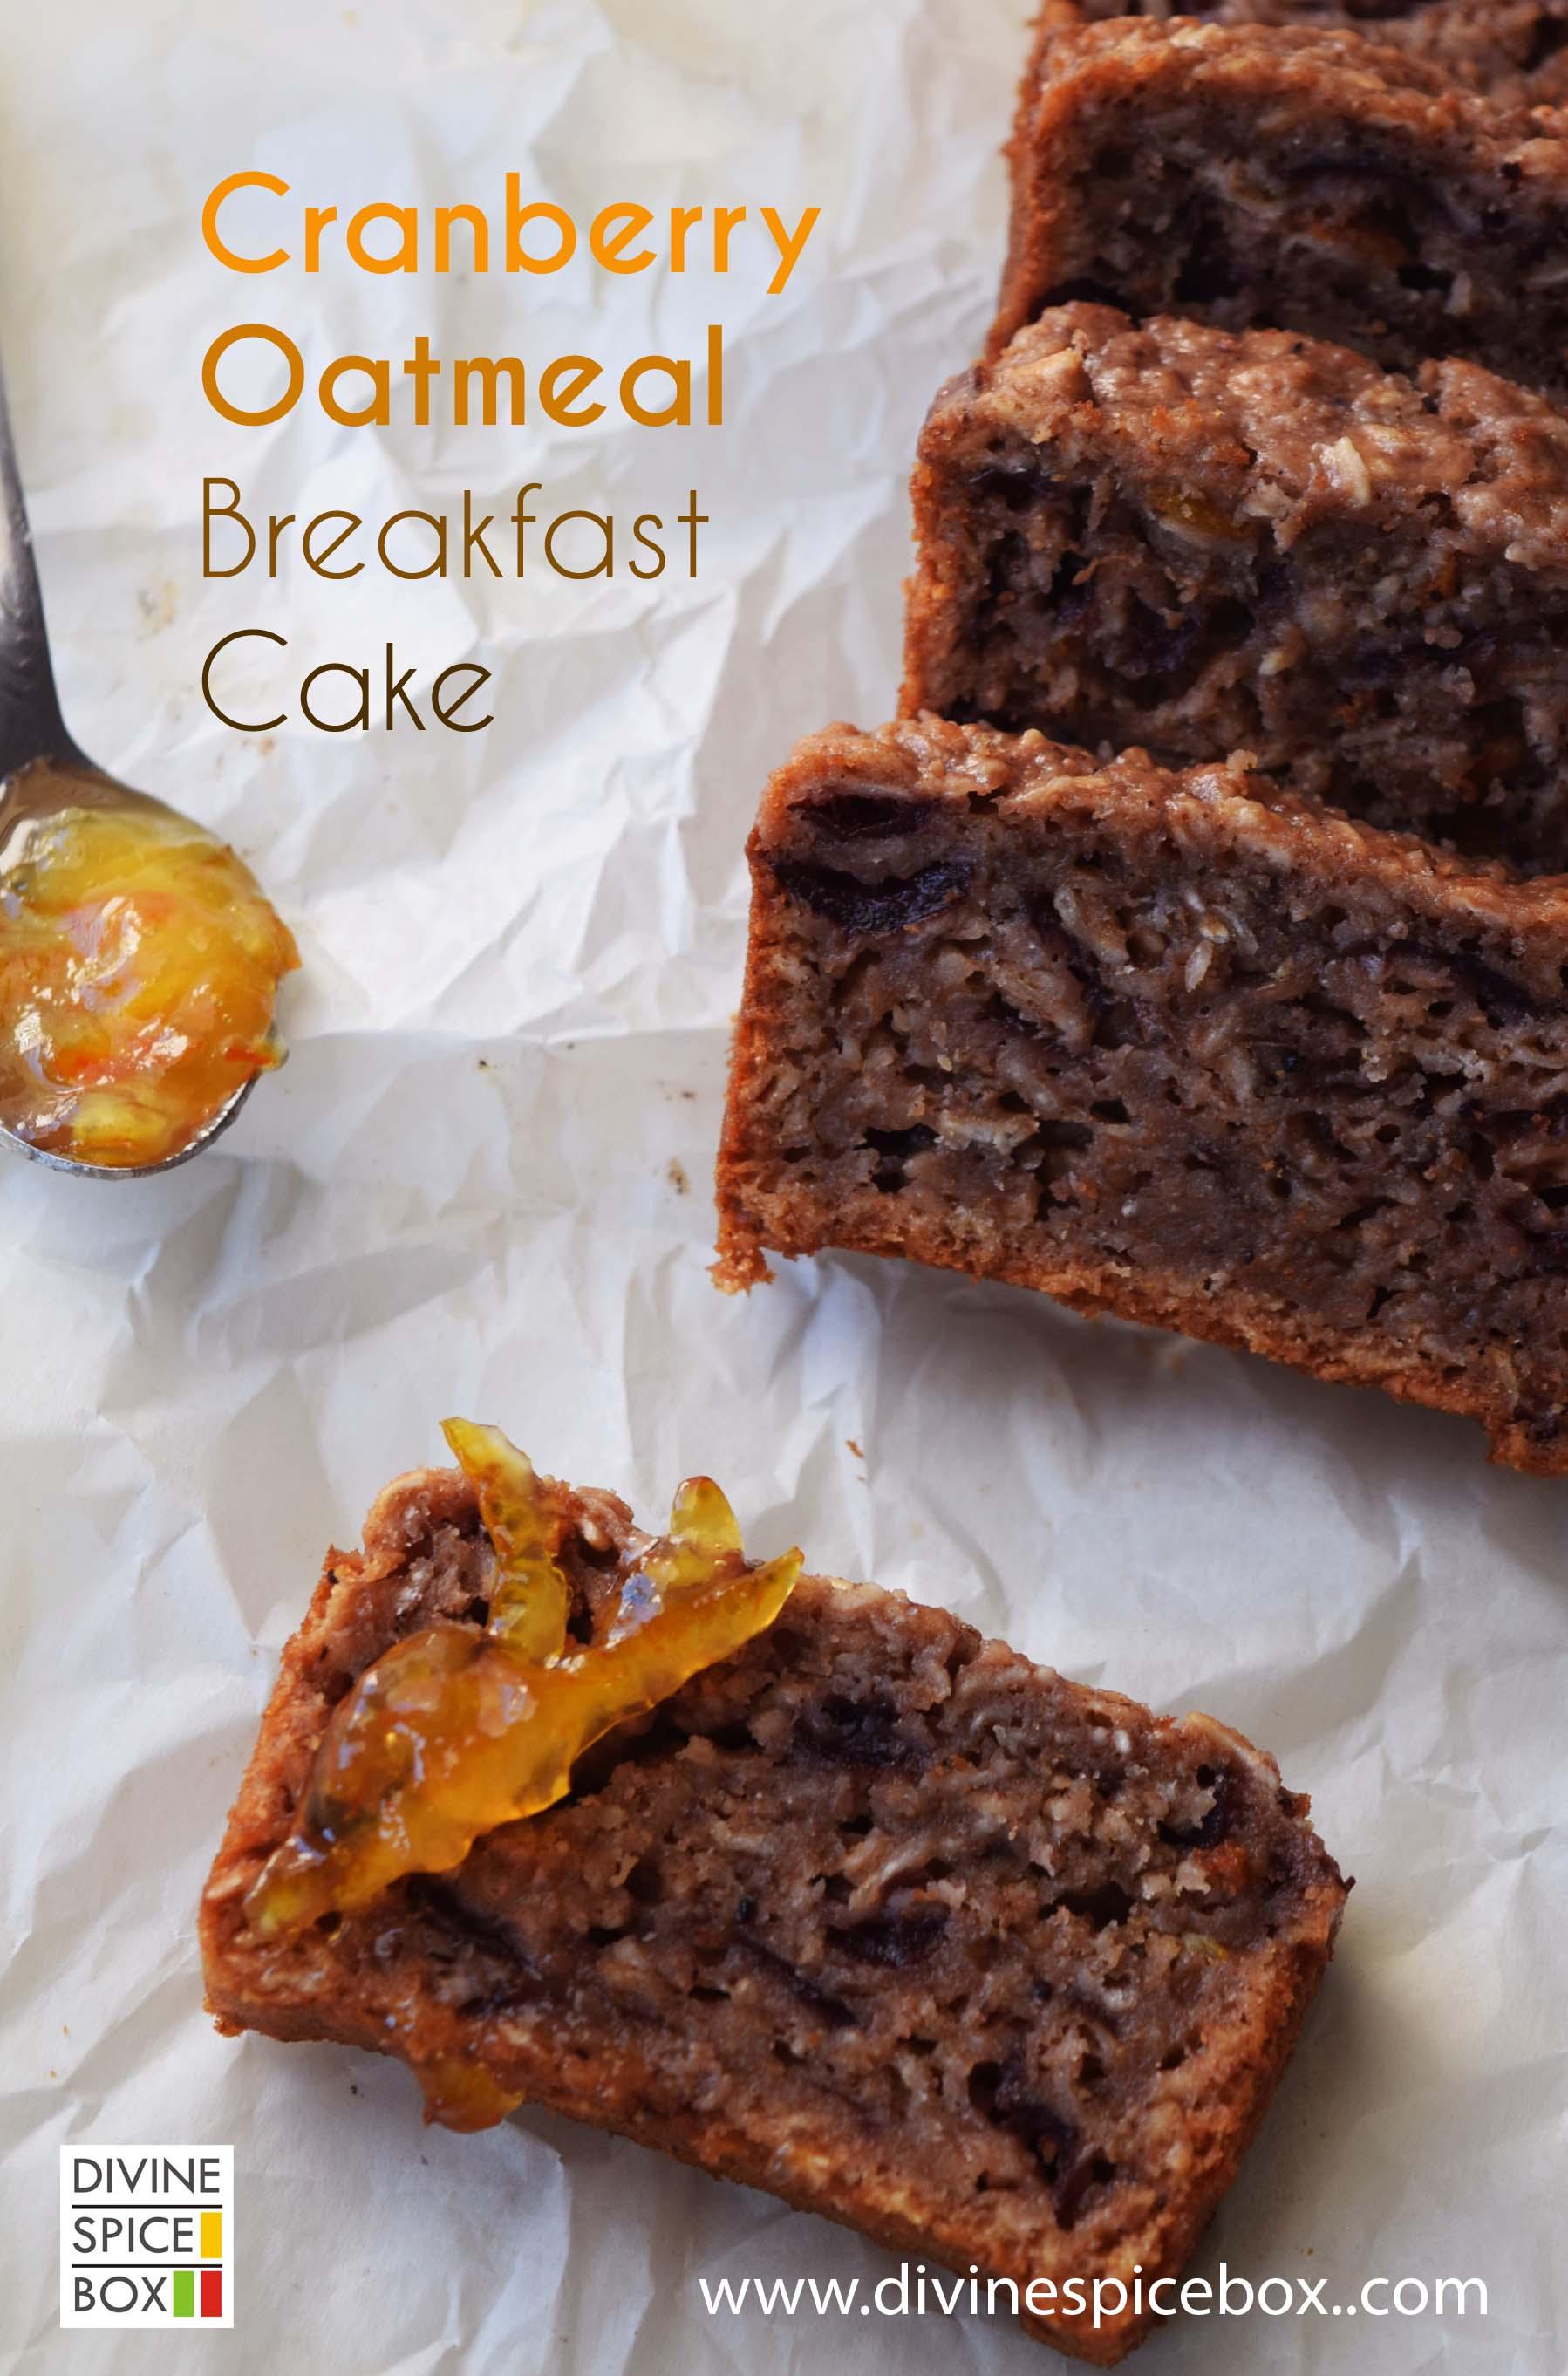 Cranberry Oatmeal Breakfast Cake